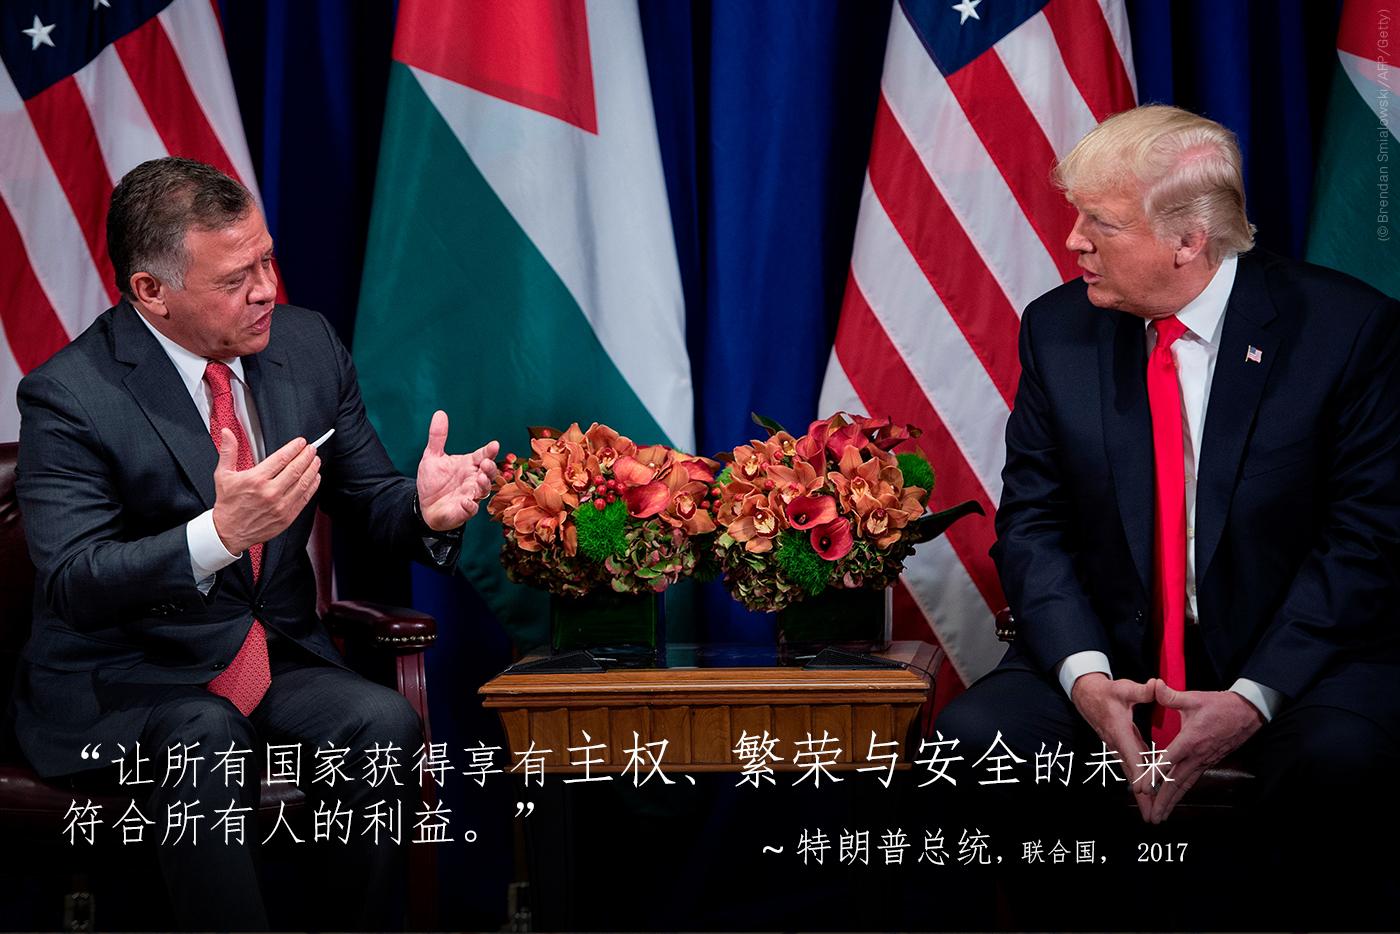 约旦国王阿卜杜拉(King Abdullah II)(左)和特朗普总统交谈。 (© Brendan Smialowski/AFP/Getty Images)